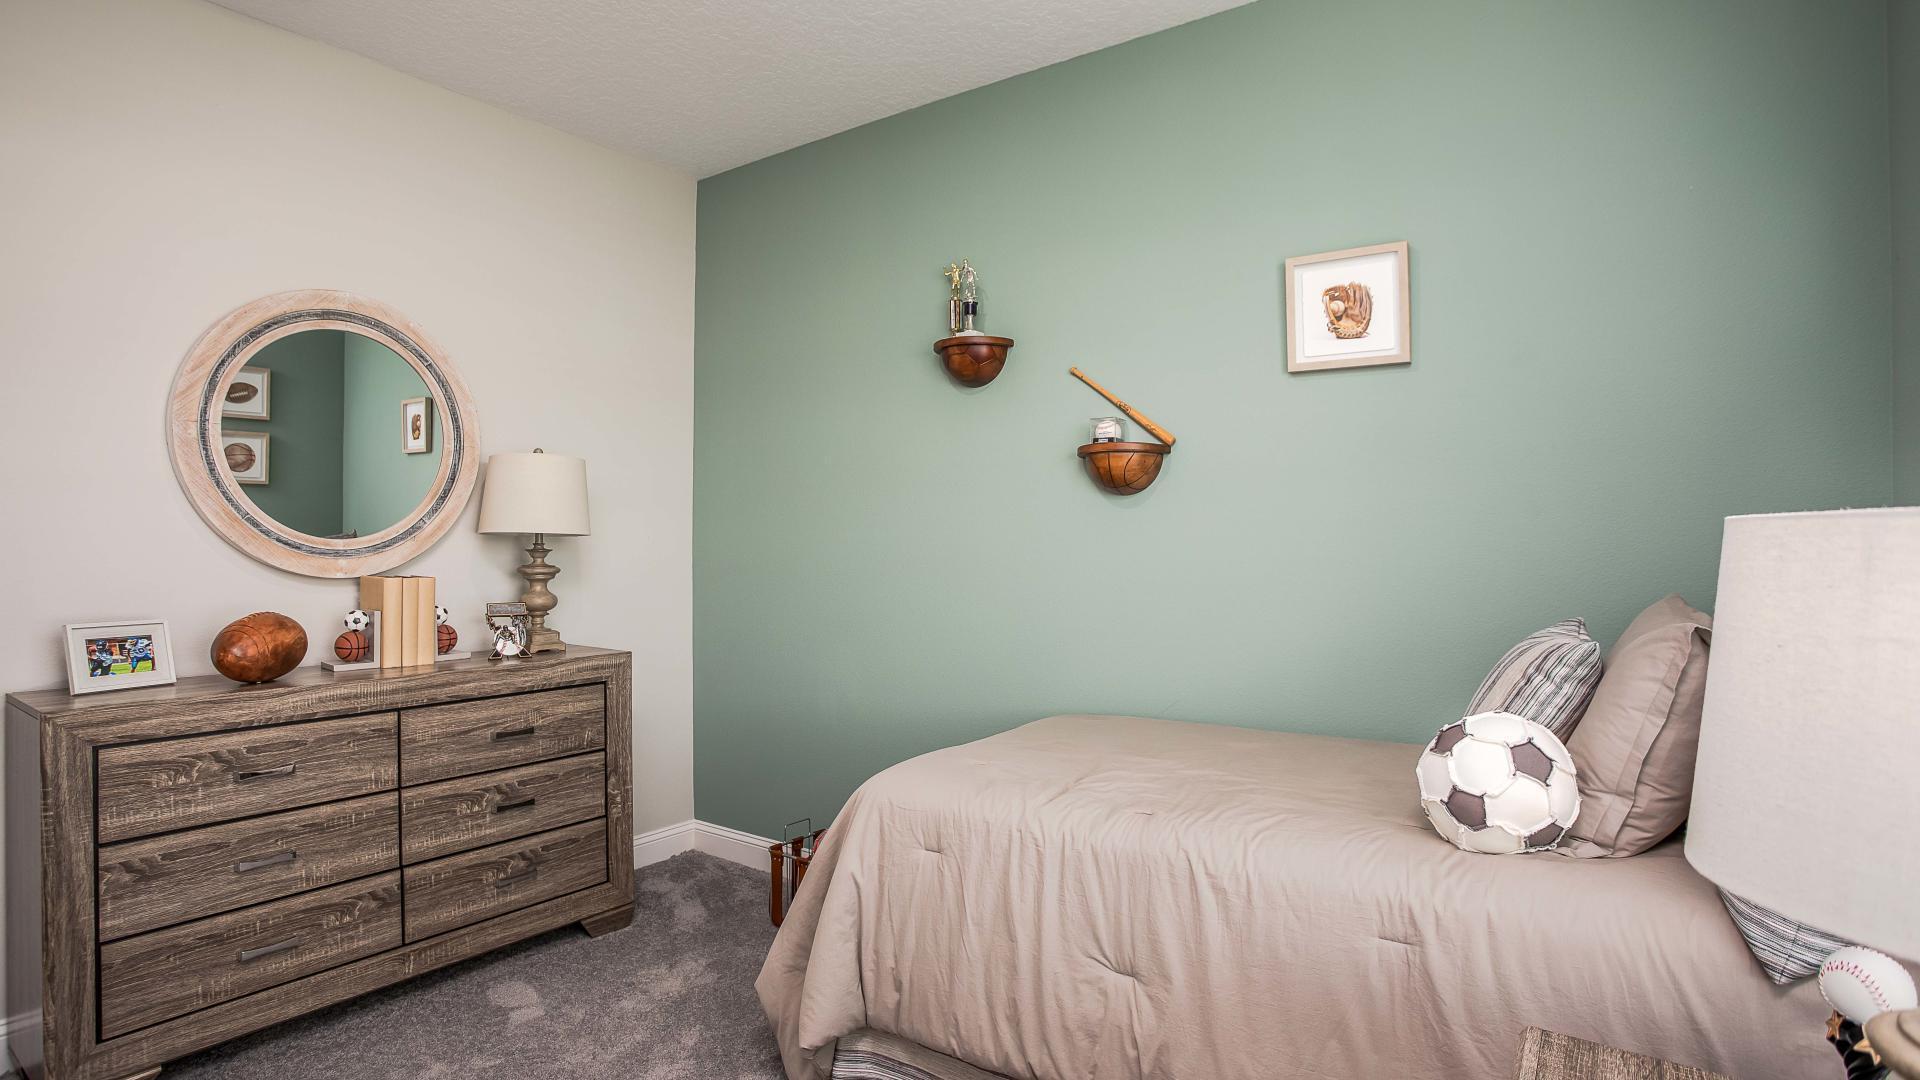 Bedroom featured in the Miramar By Maronda Homes in Daytona Beach, FL